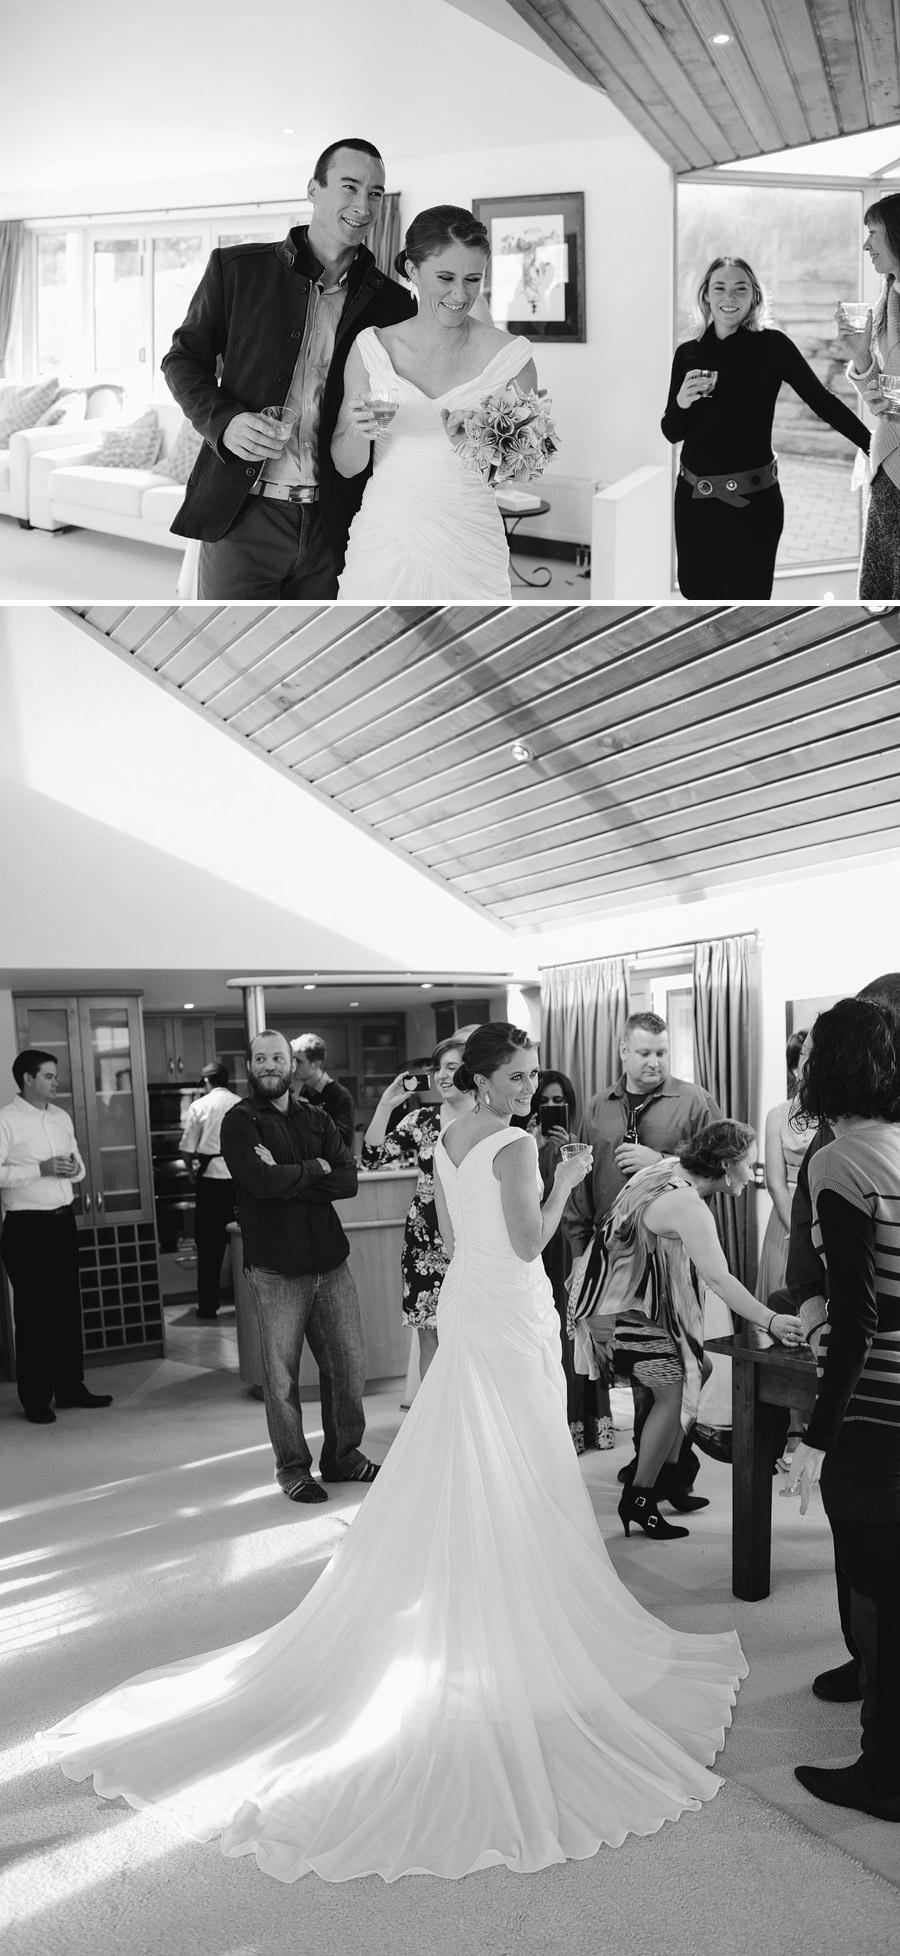 Queenstown Wedding Photographers: Reception